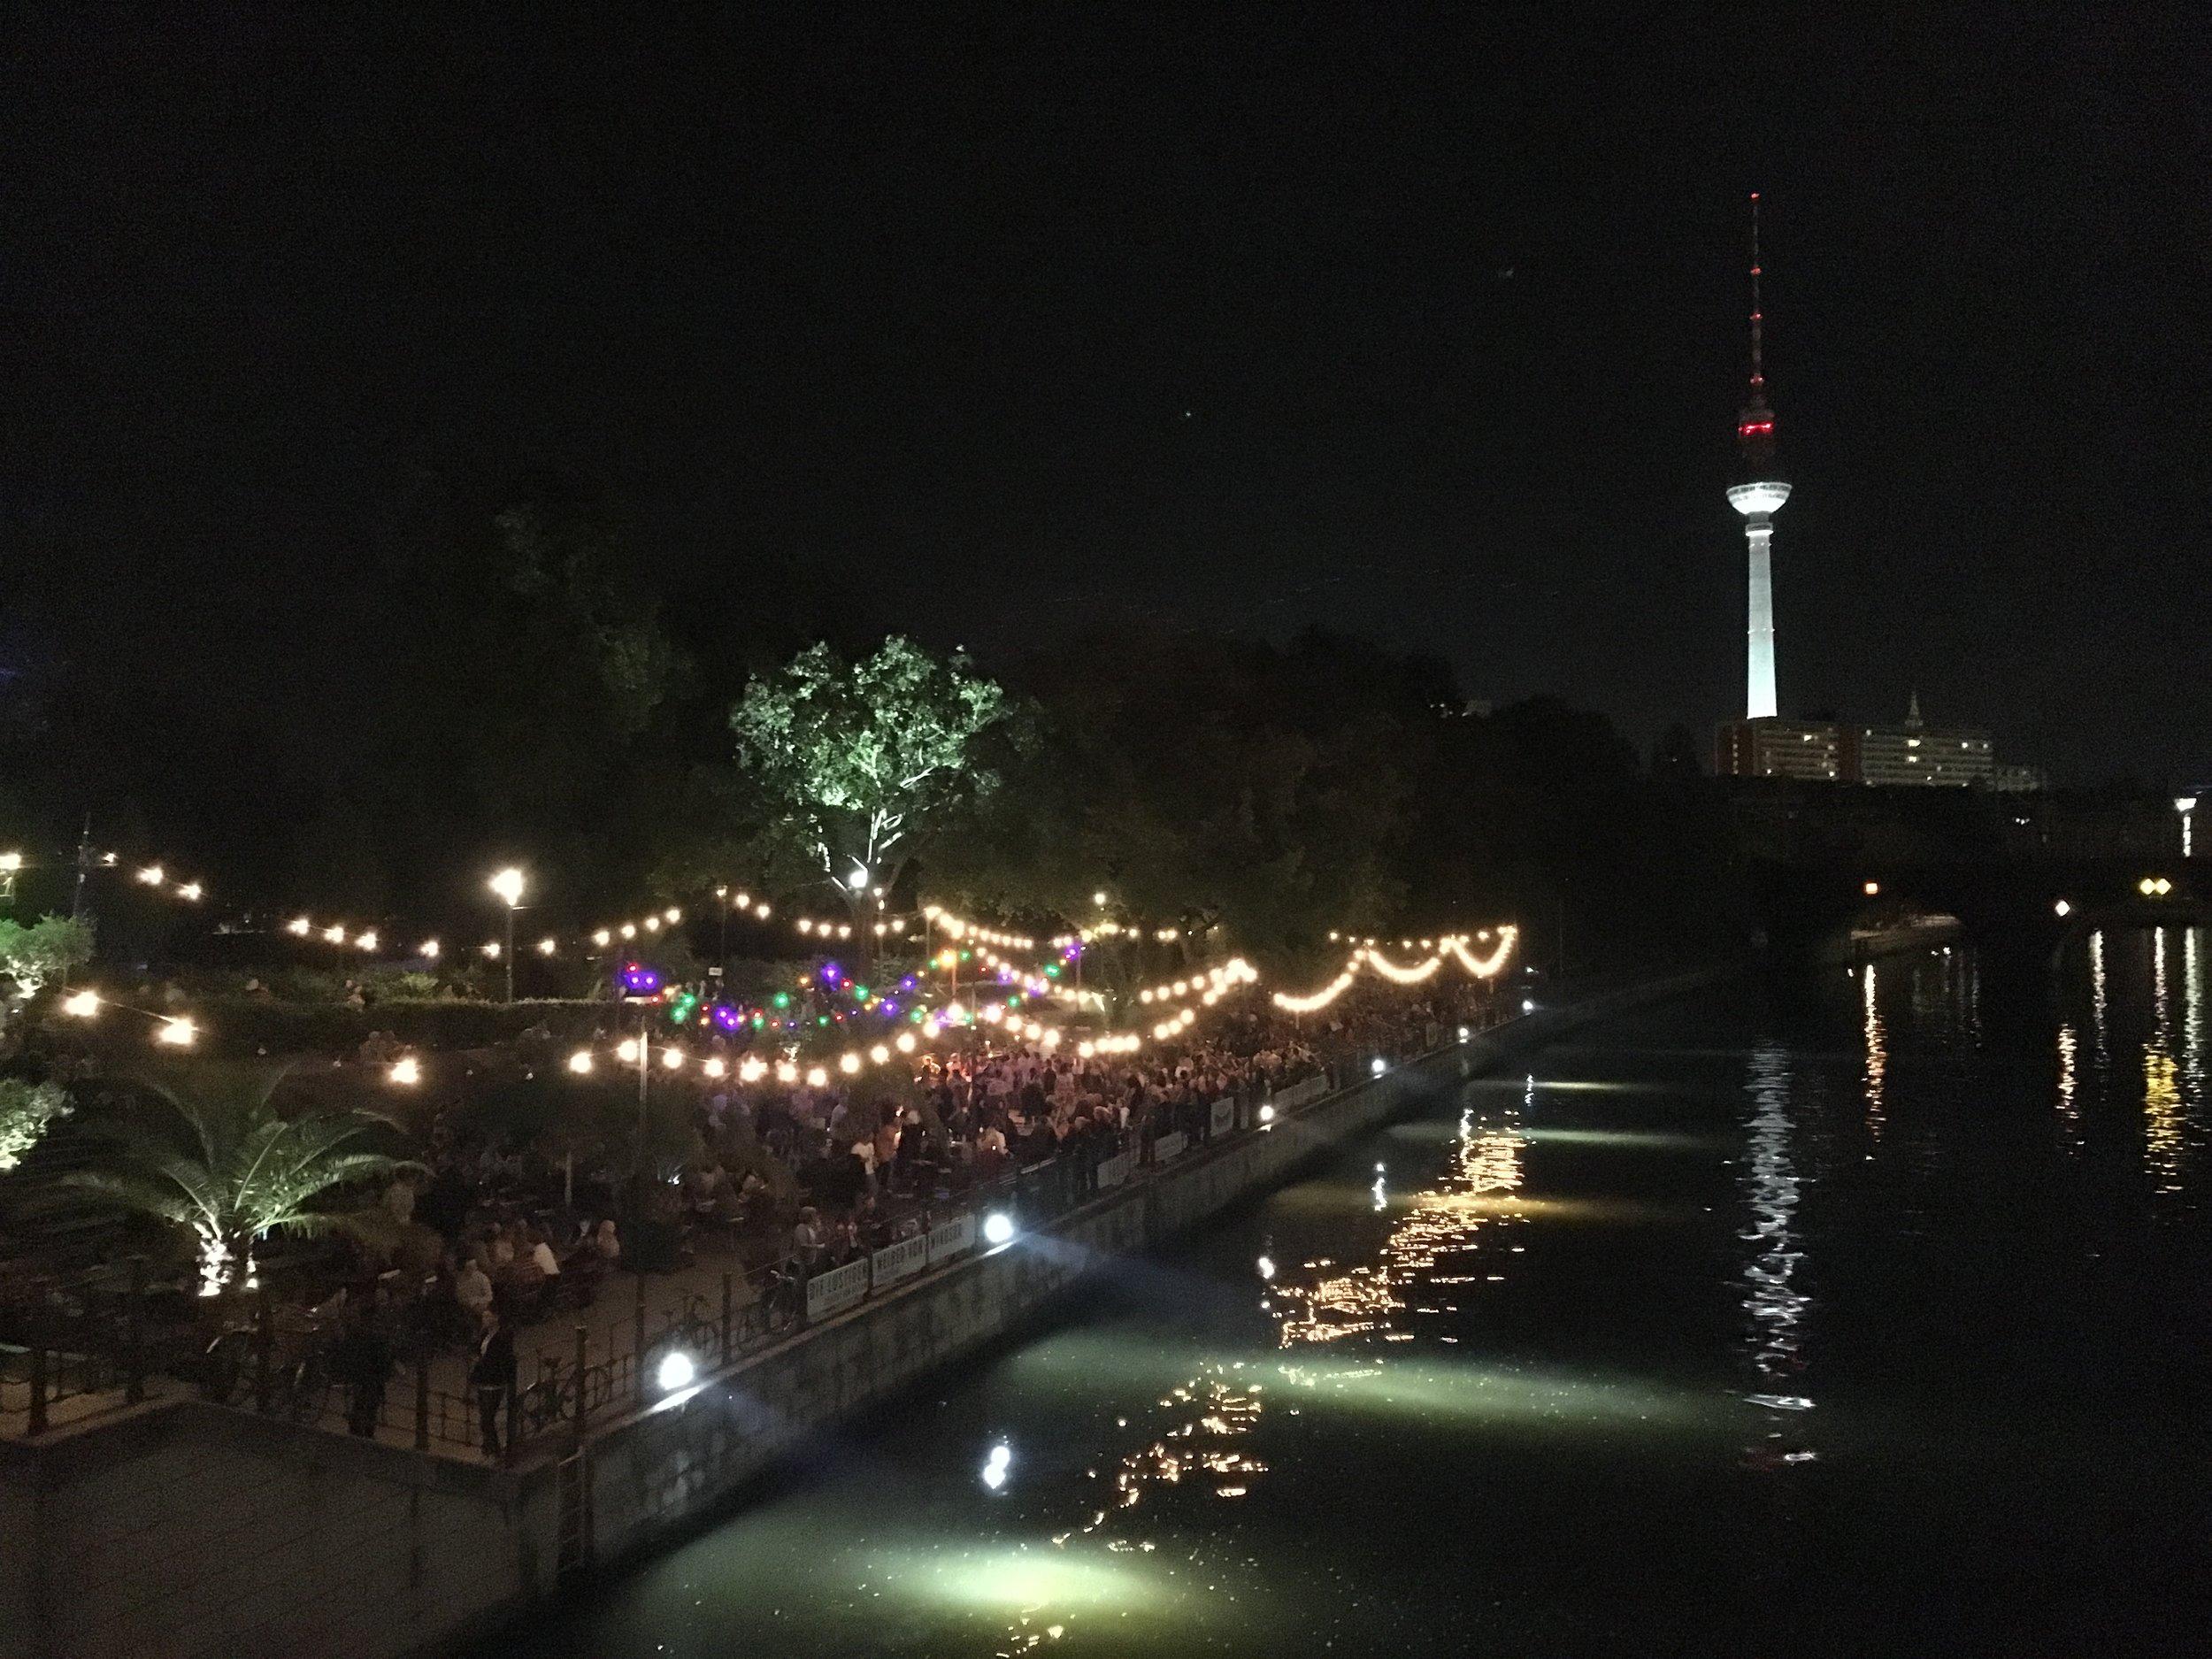 Strandbar-Mitte-Berlin-view